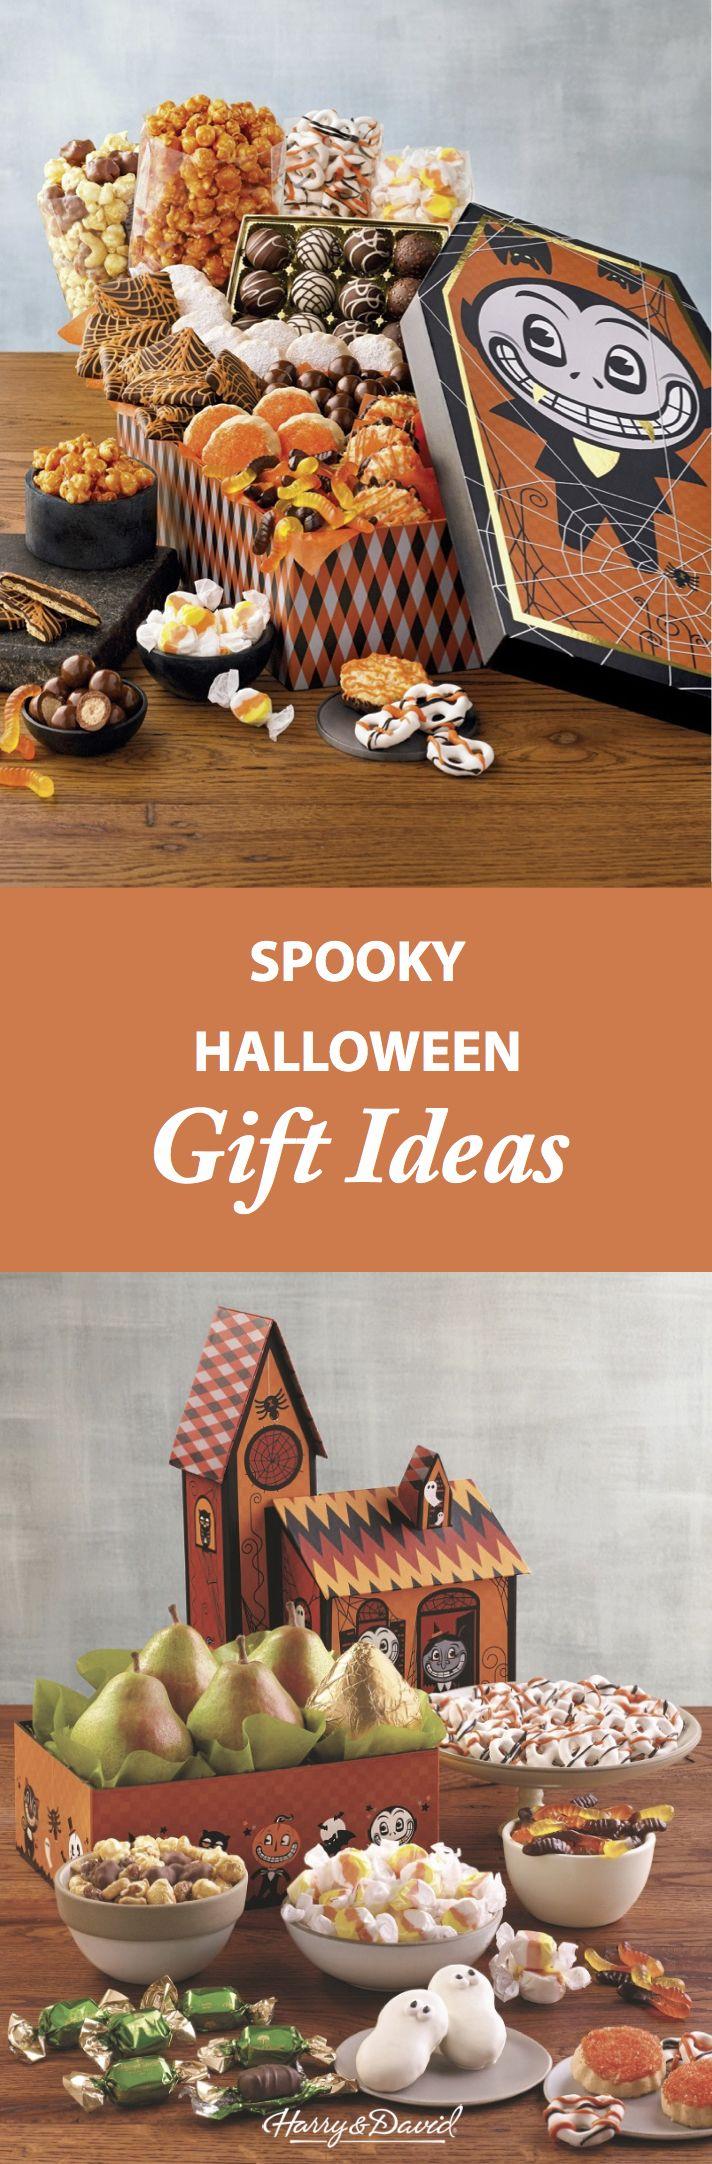 Harry and david halloween gift baskets